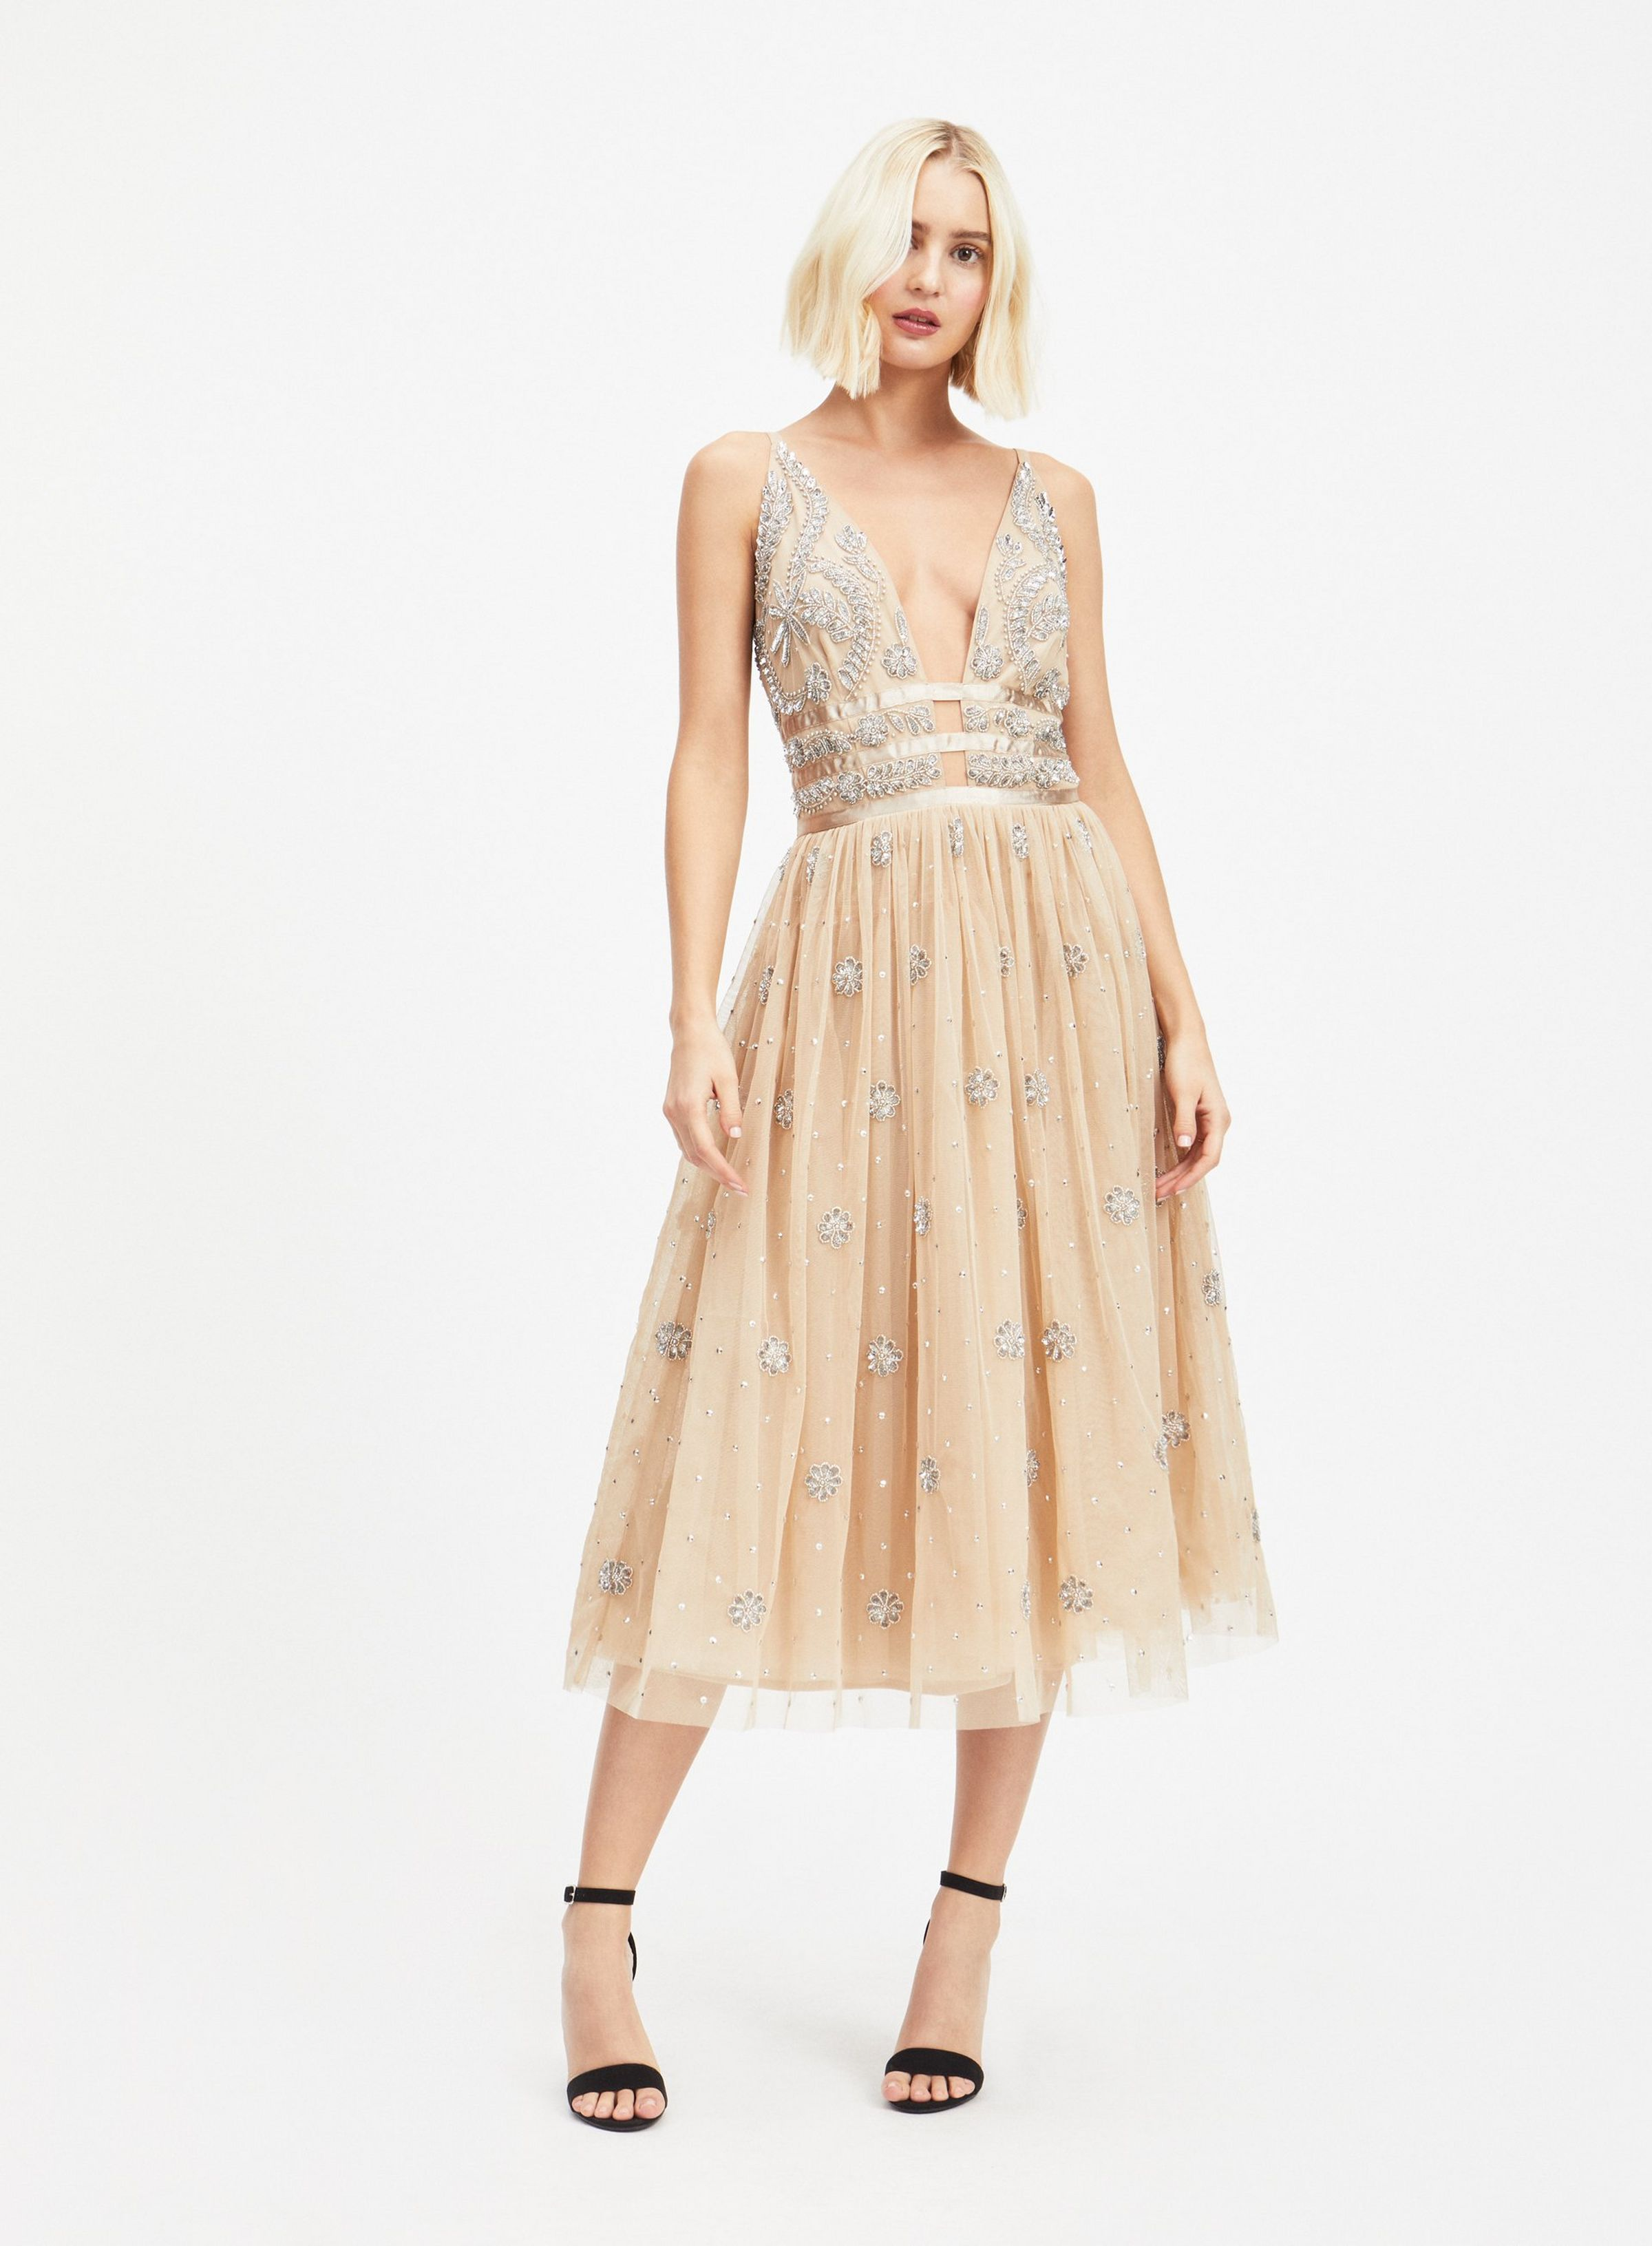 071969ae672 Genuine Prom Dress Websites Uk - Data Dynamic AG